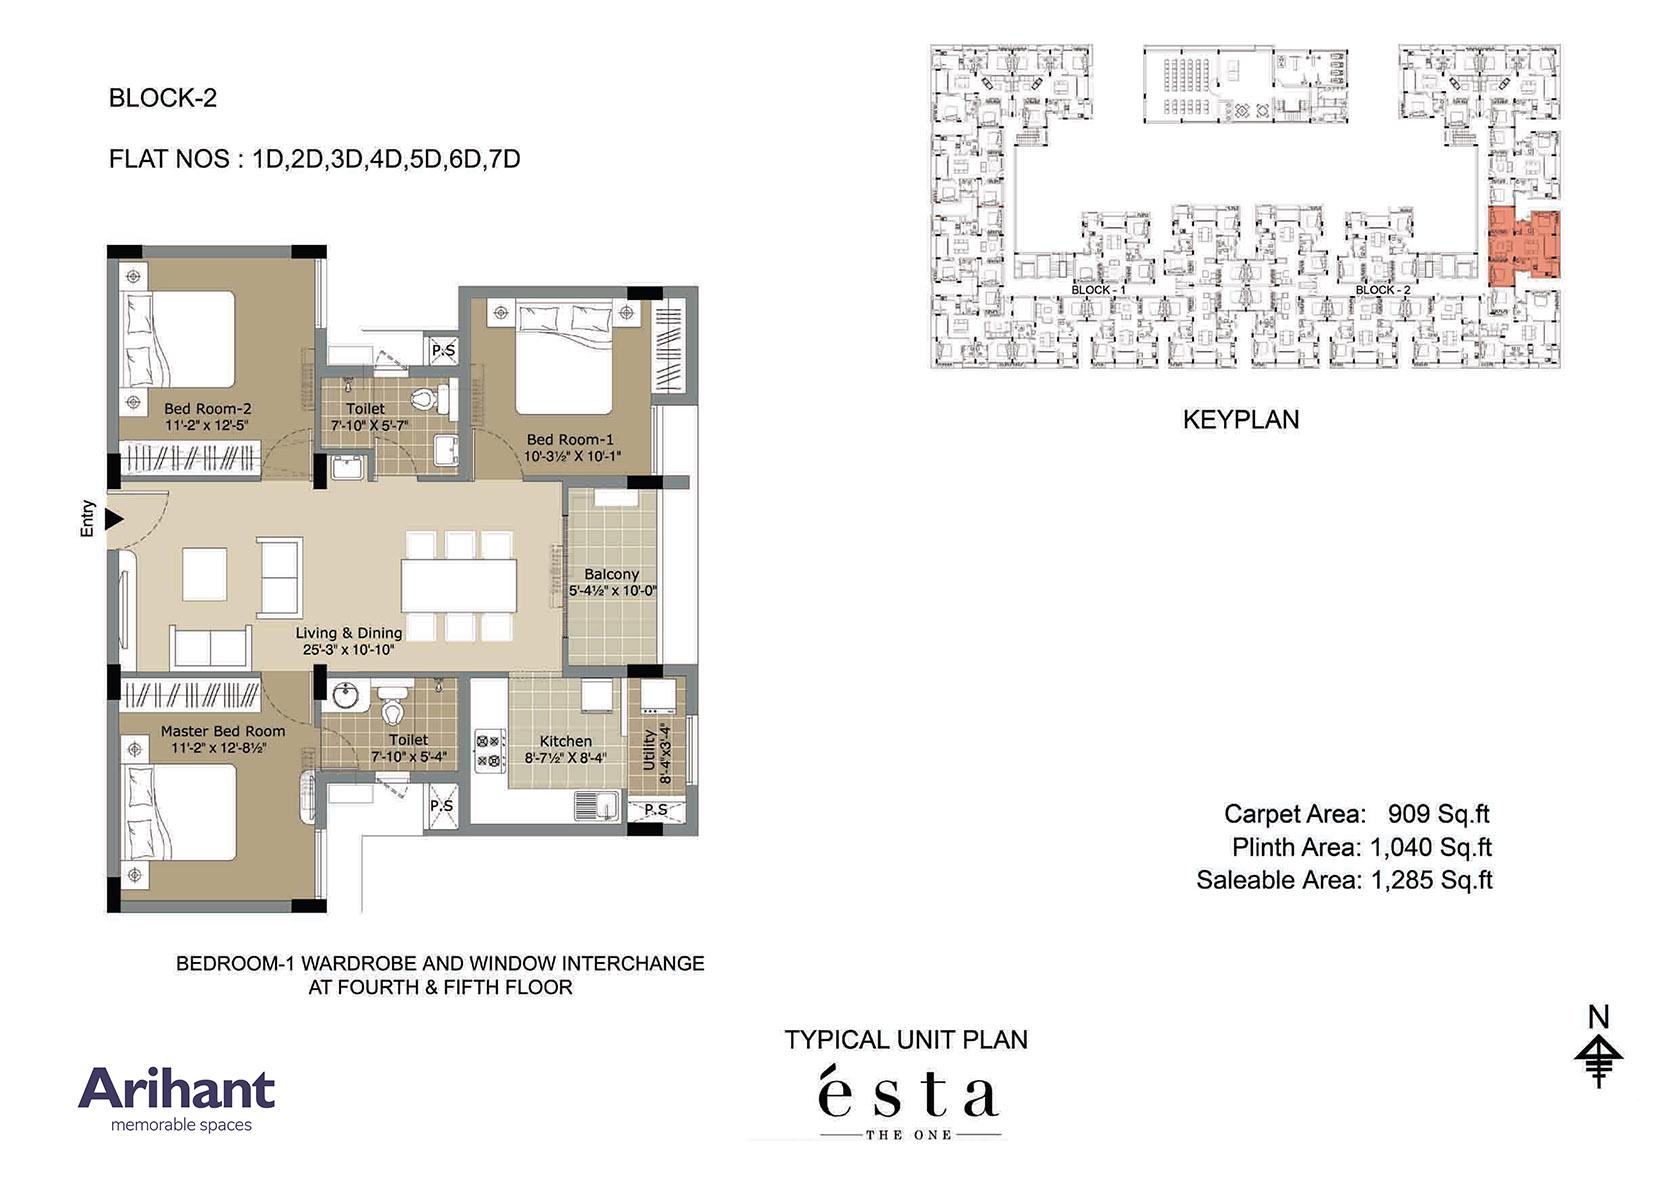 Arihant - Esta_Typical Unit Plan - Block 2 - Type D